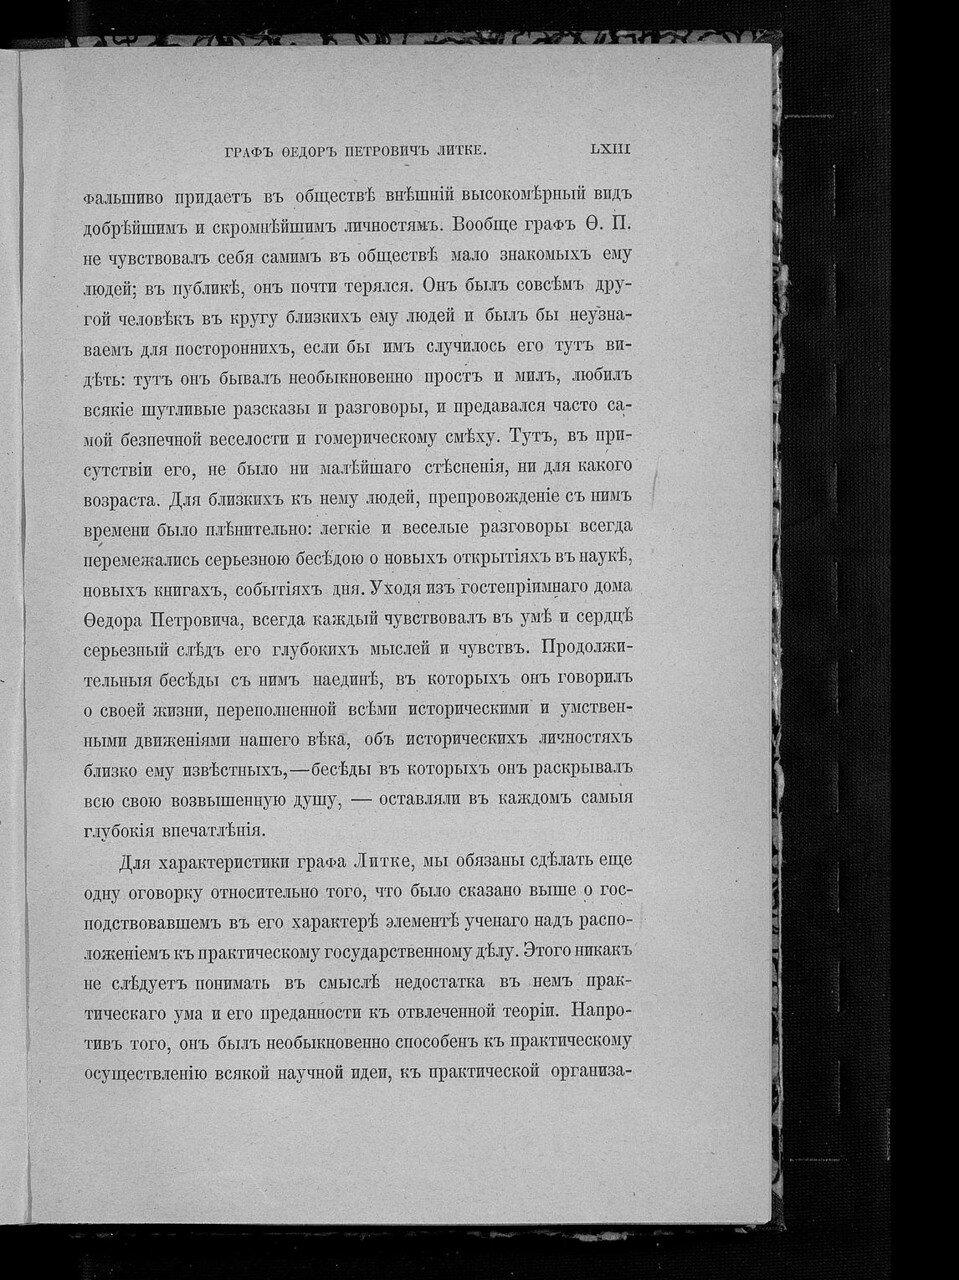 https://img-fotki.yandex.ru/get/742275/199368979.d3/0_21dd91_fe14219c_XXXL.jpg